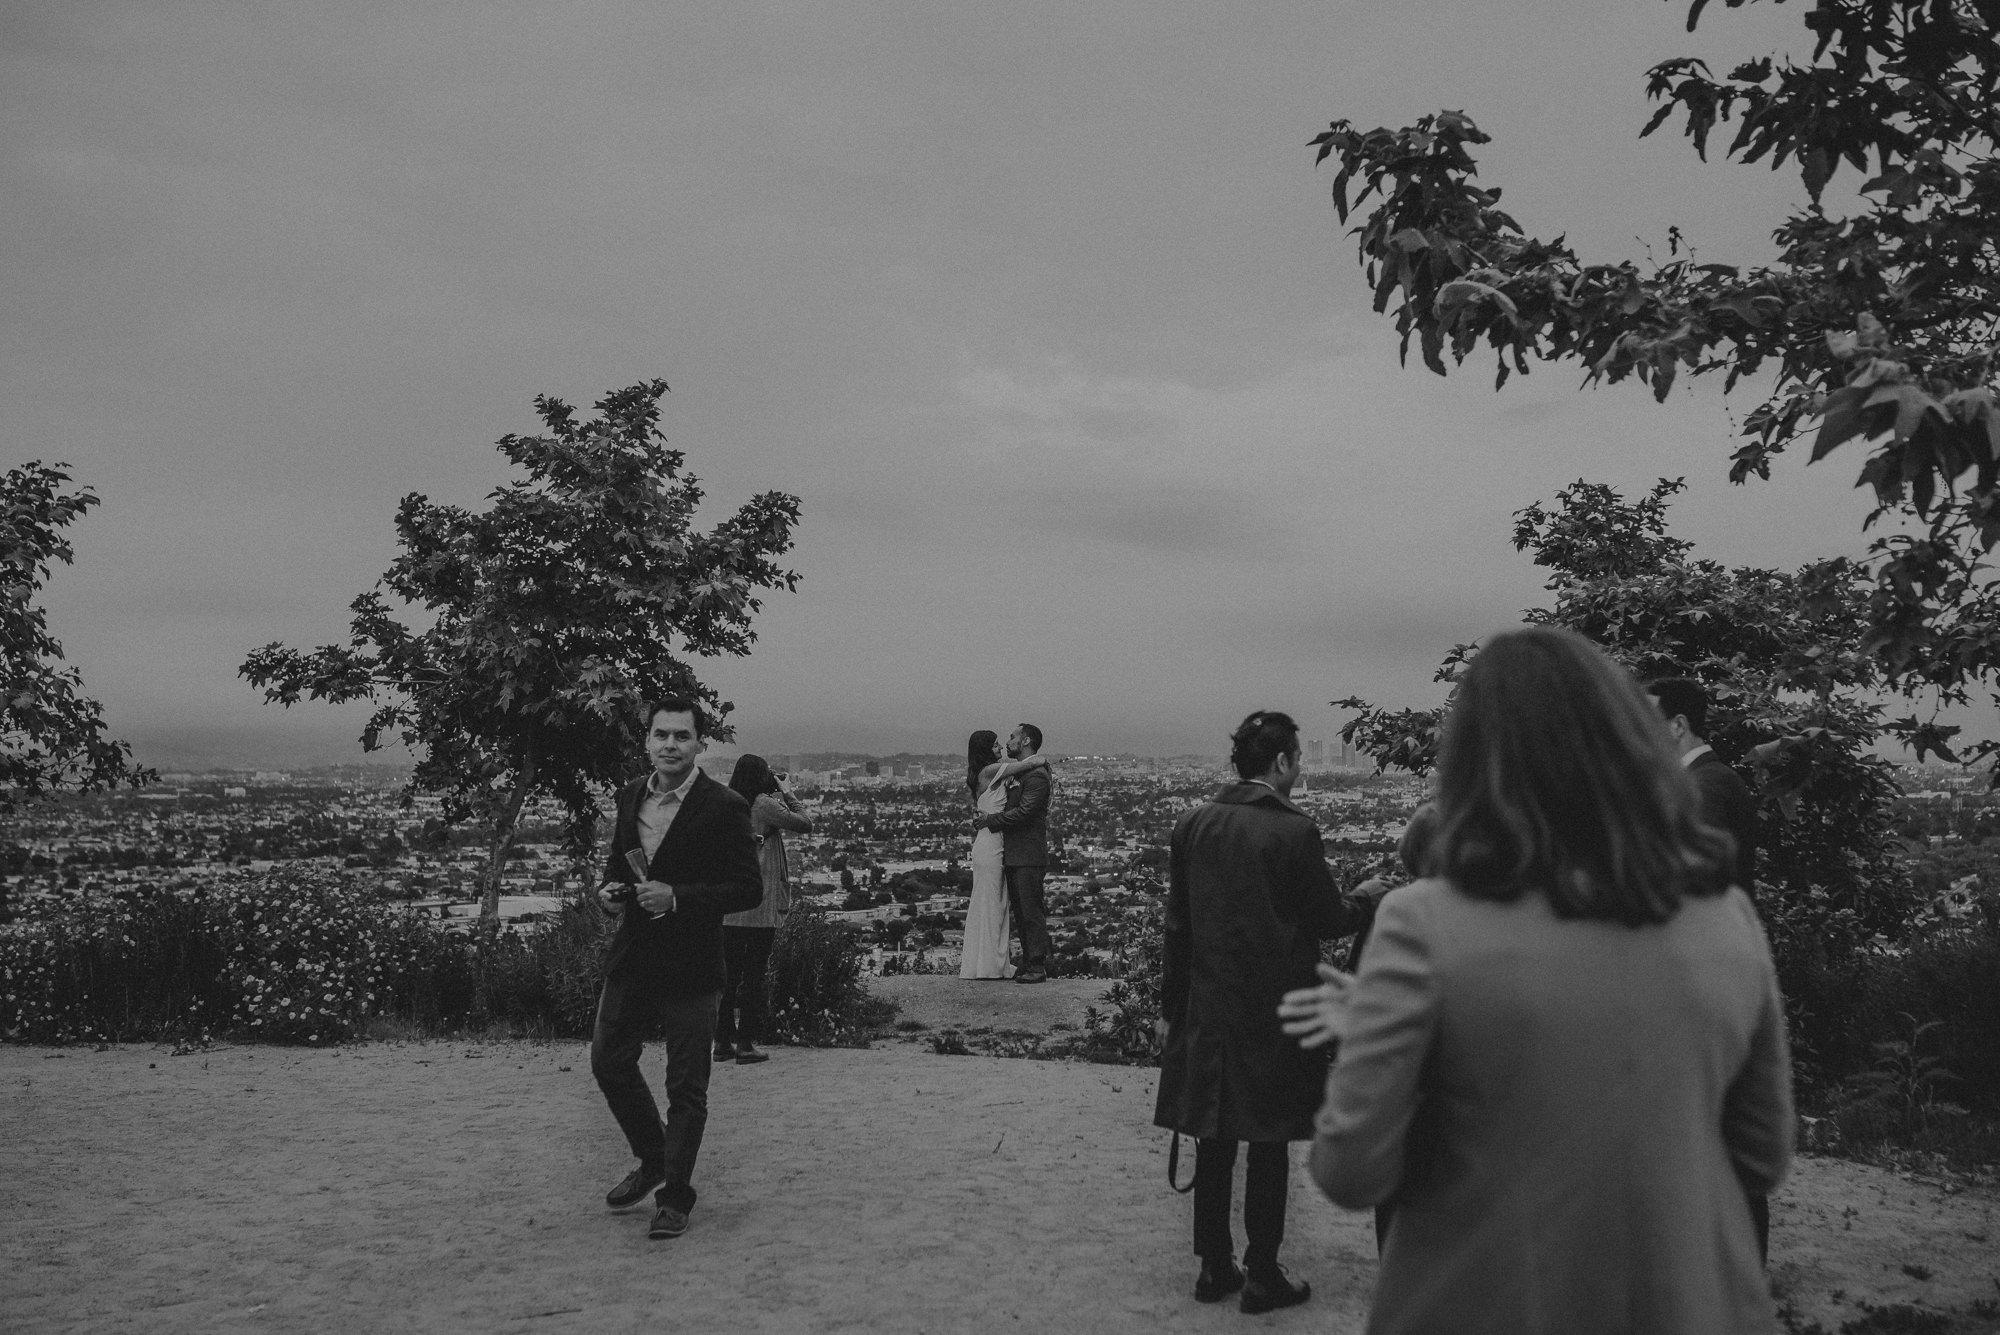 elopement photographer in los angeles - la wedding photographer - isaiahandtaylor.com-075.jpg